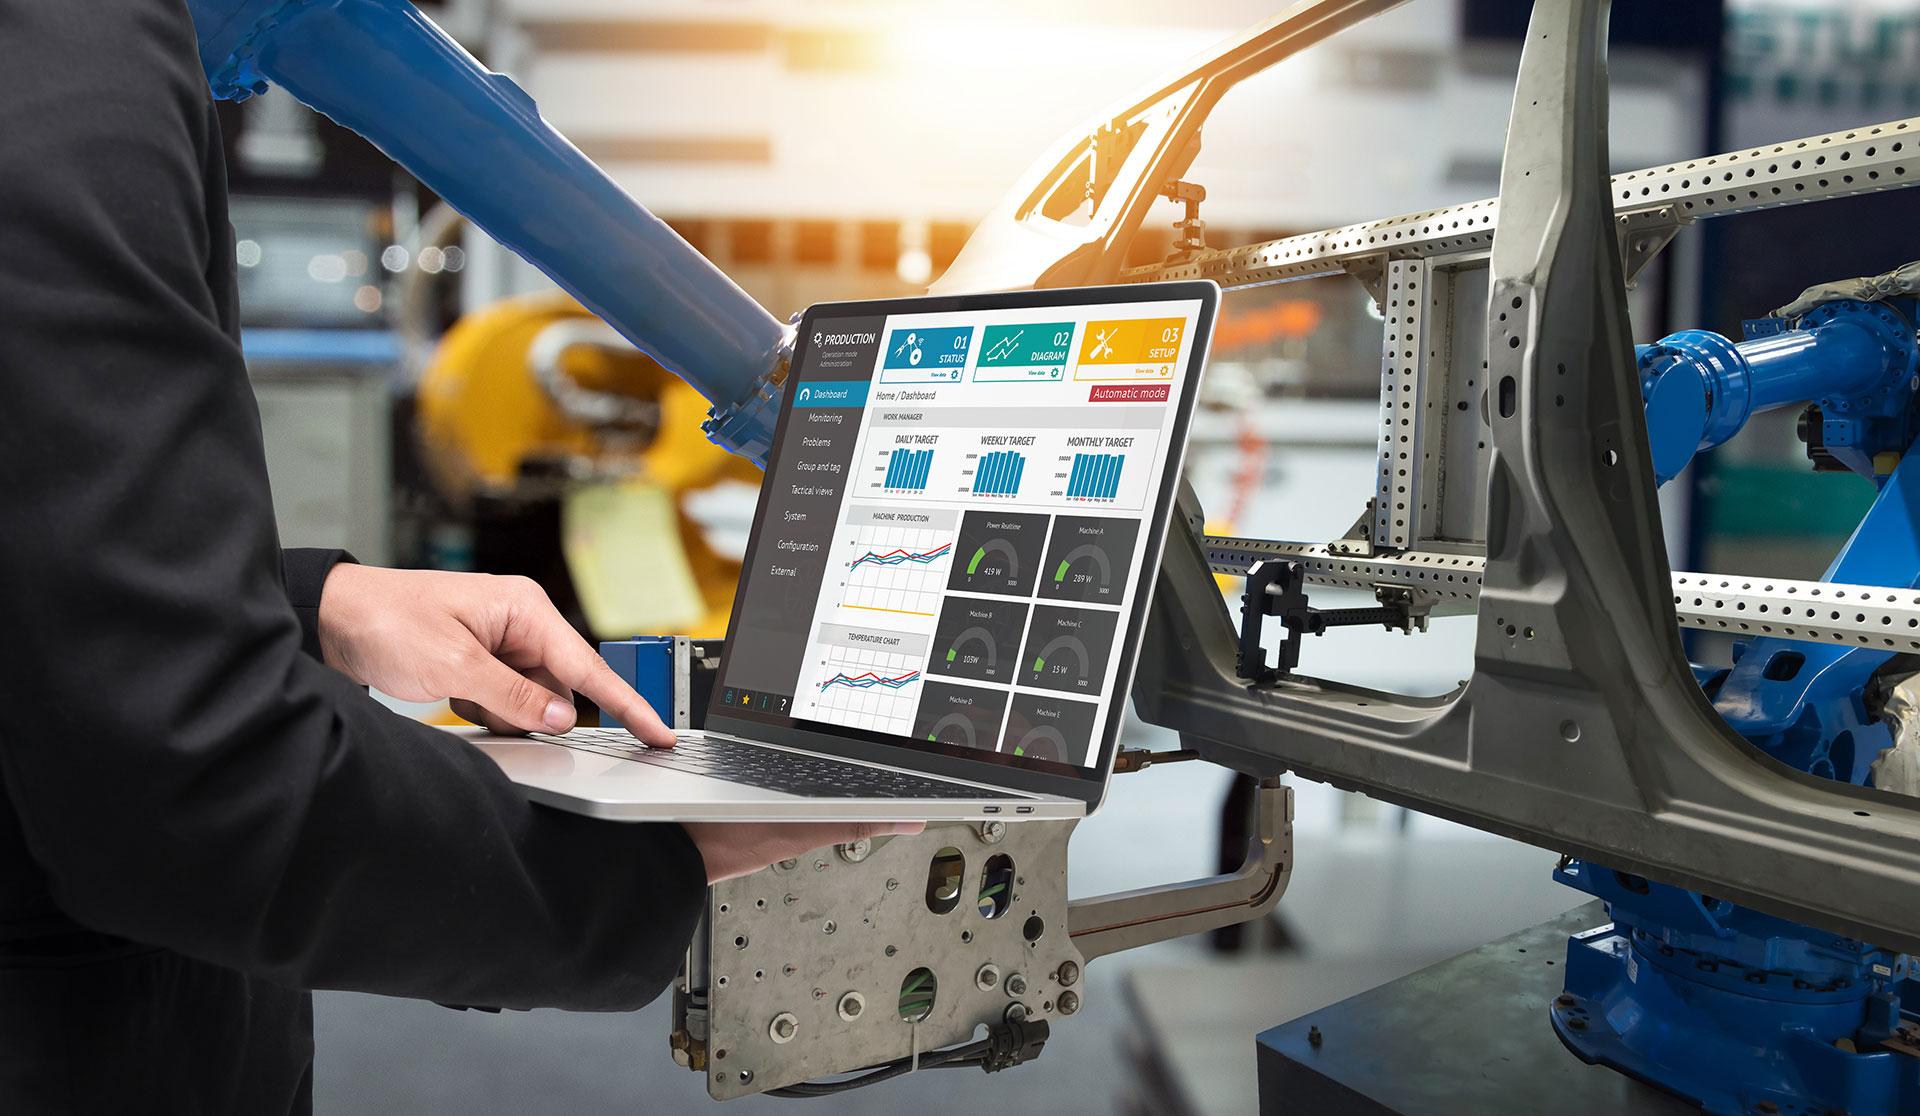 IT Insight 製造業で活用されるシステムの種類と最新動向